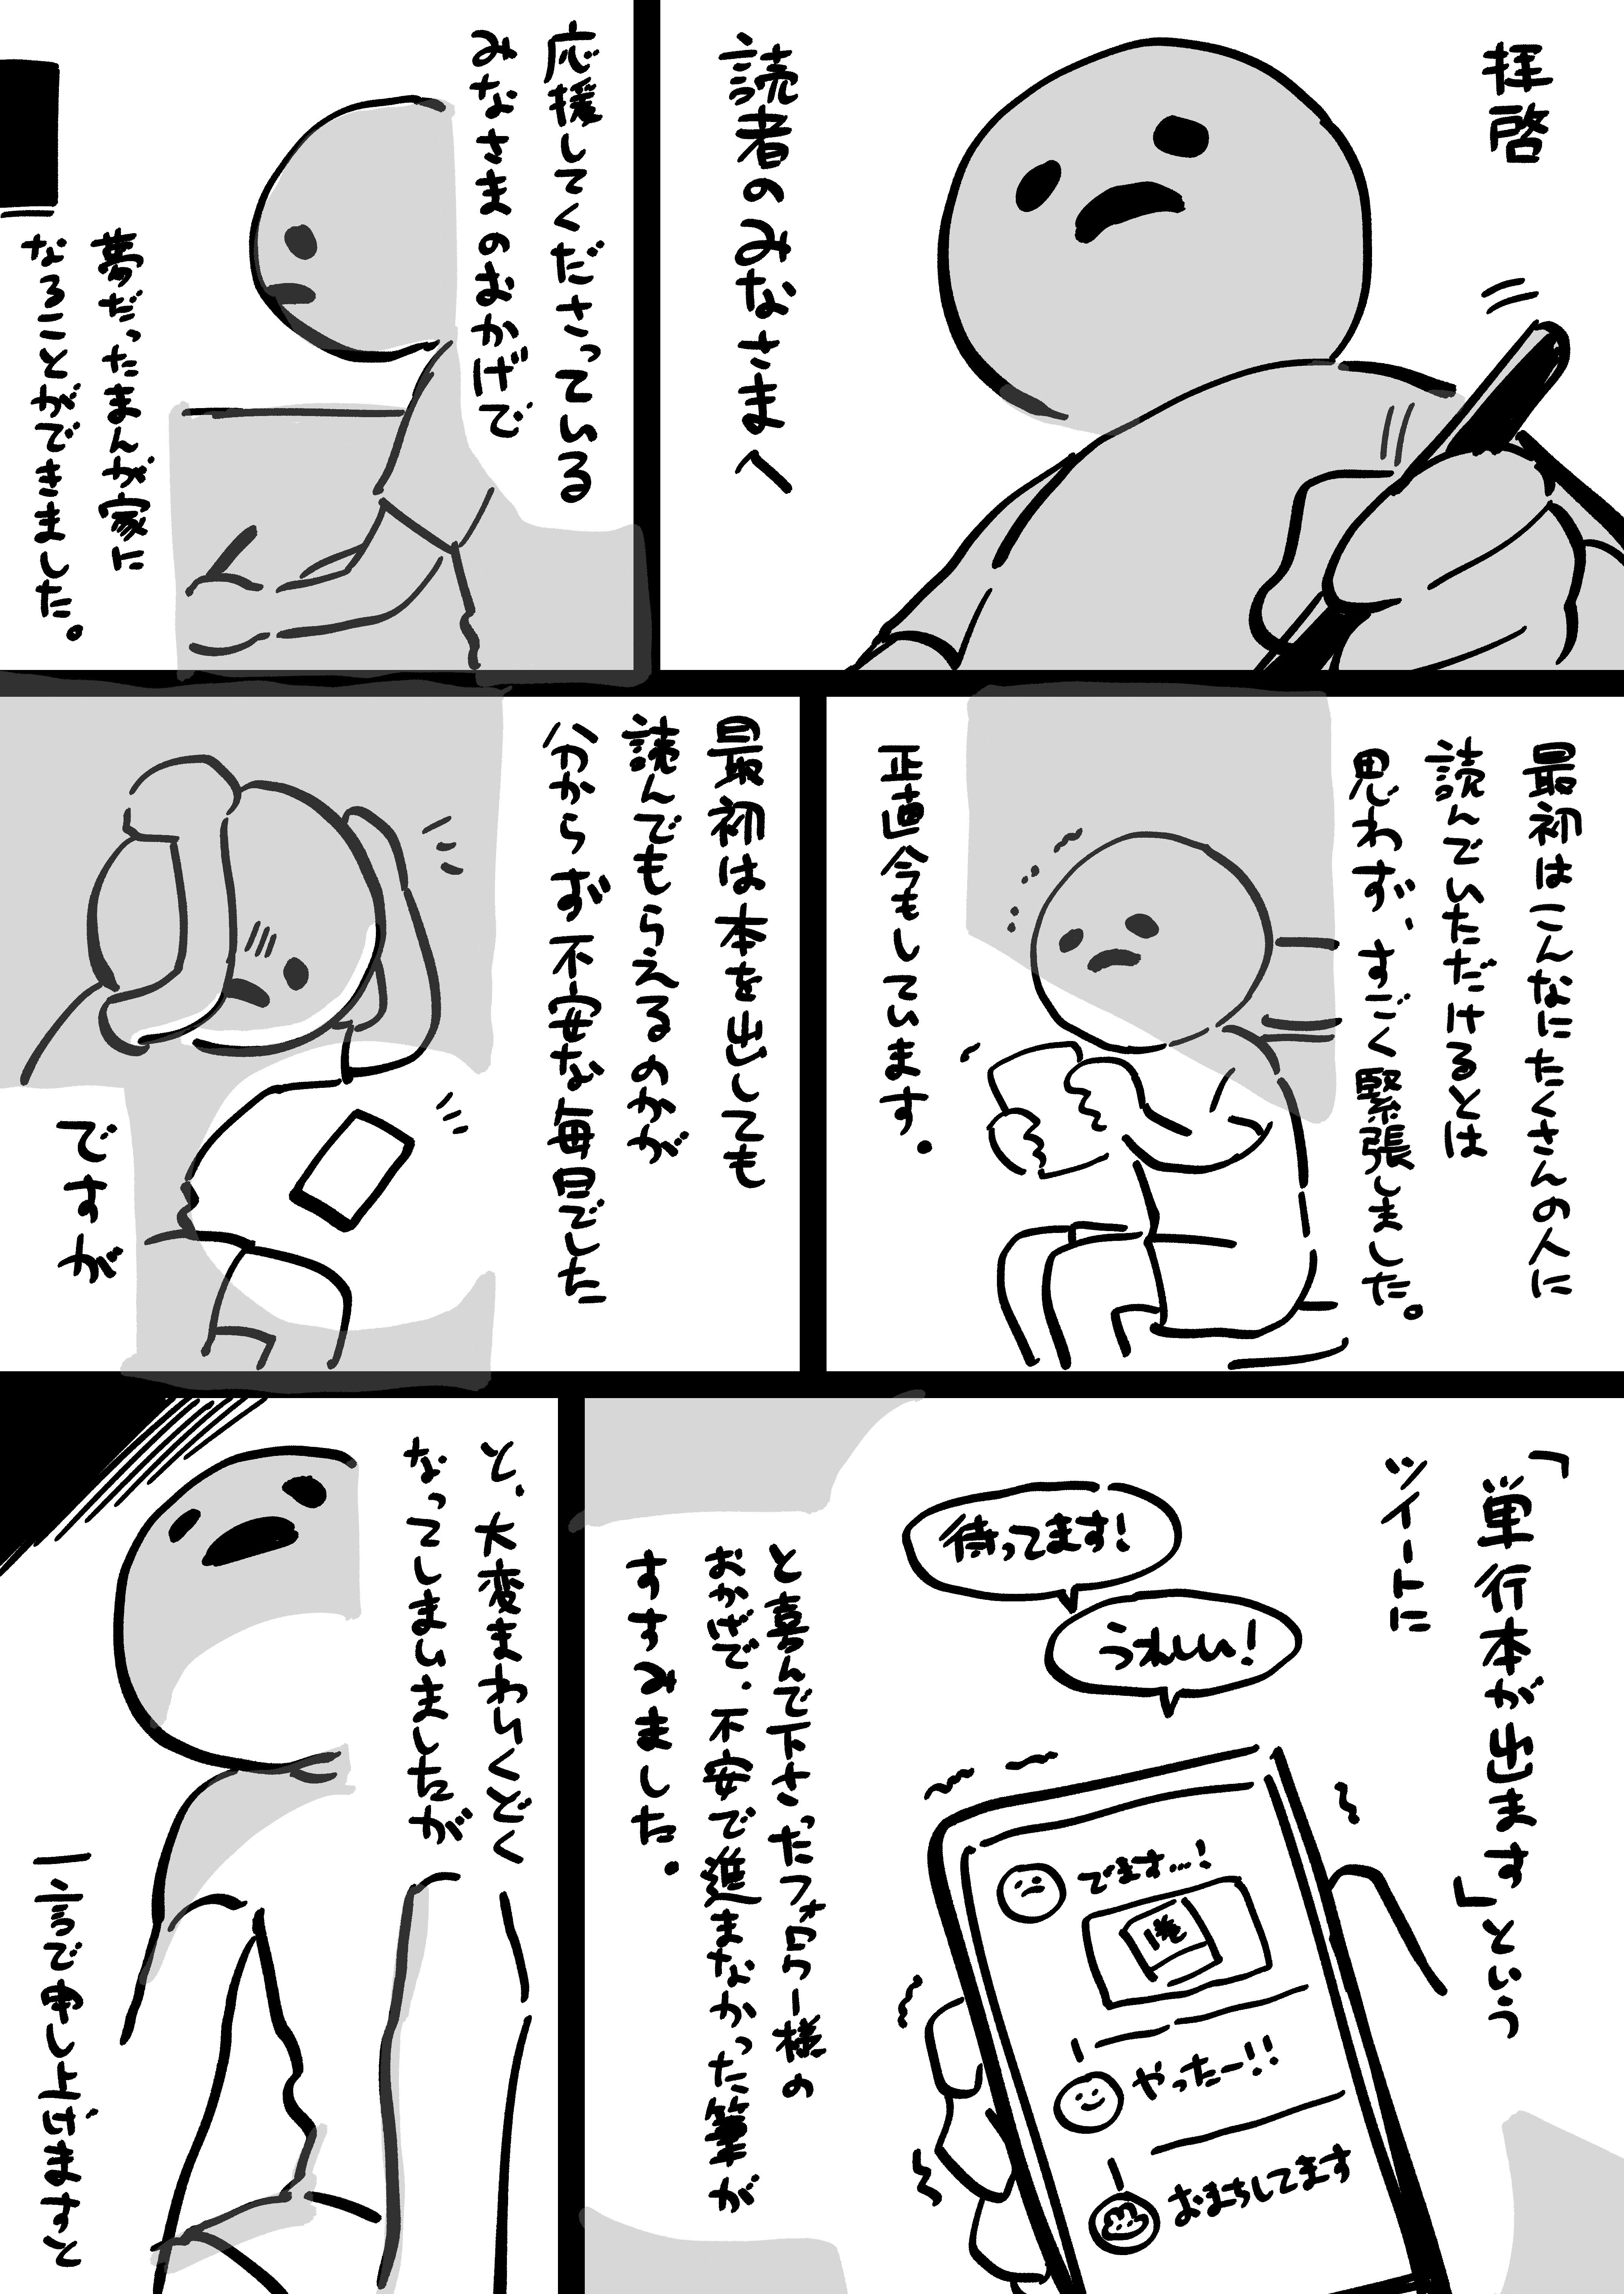 原神 Alter Ganyu - dishwasher1910的插画 初五【17P】-小柚妹站